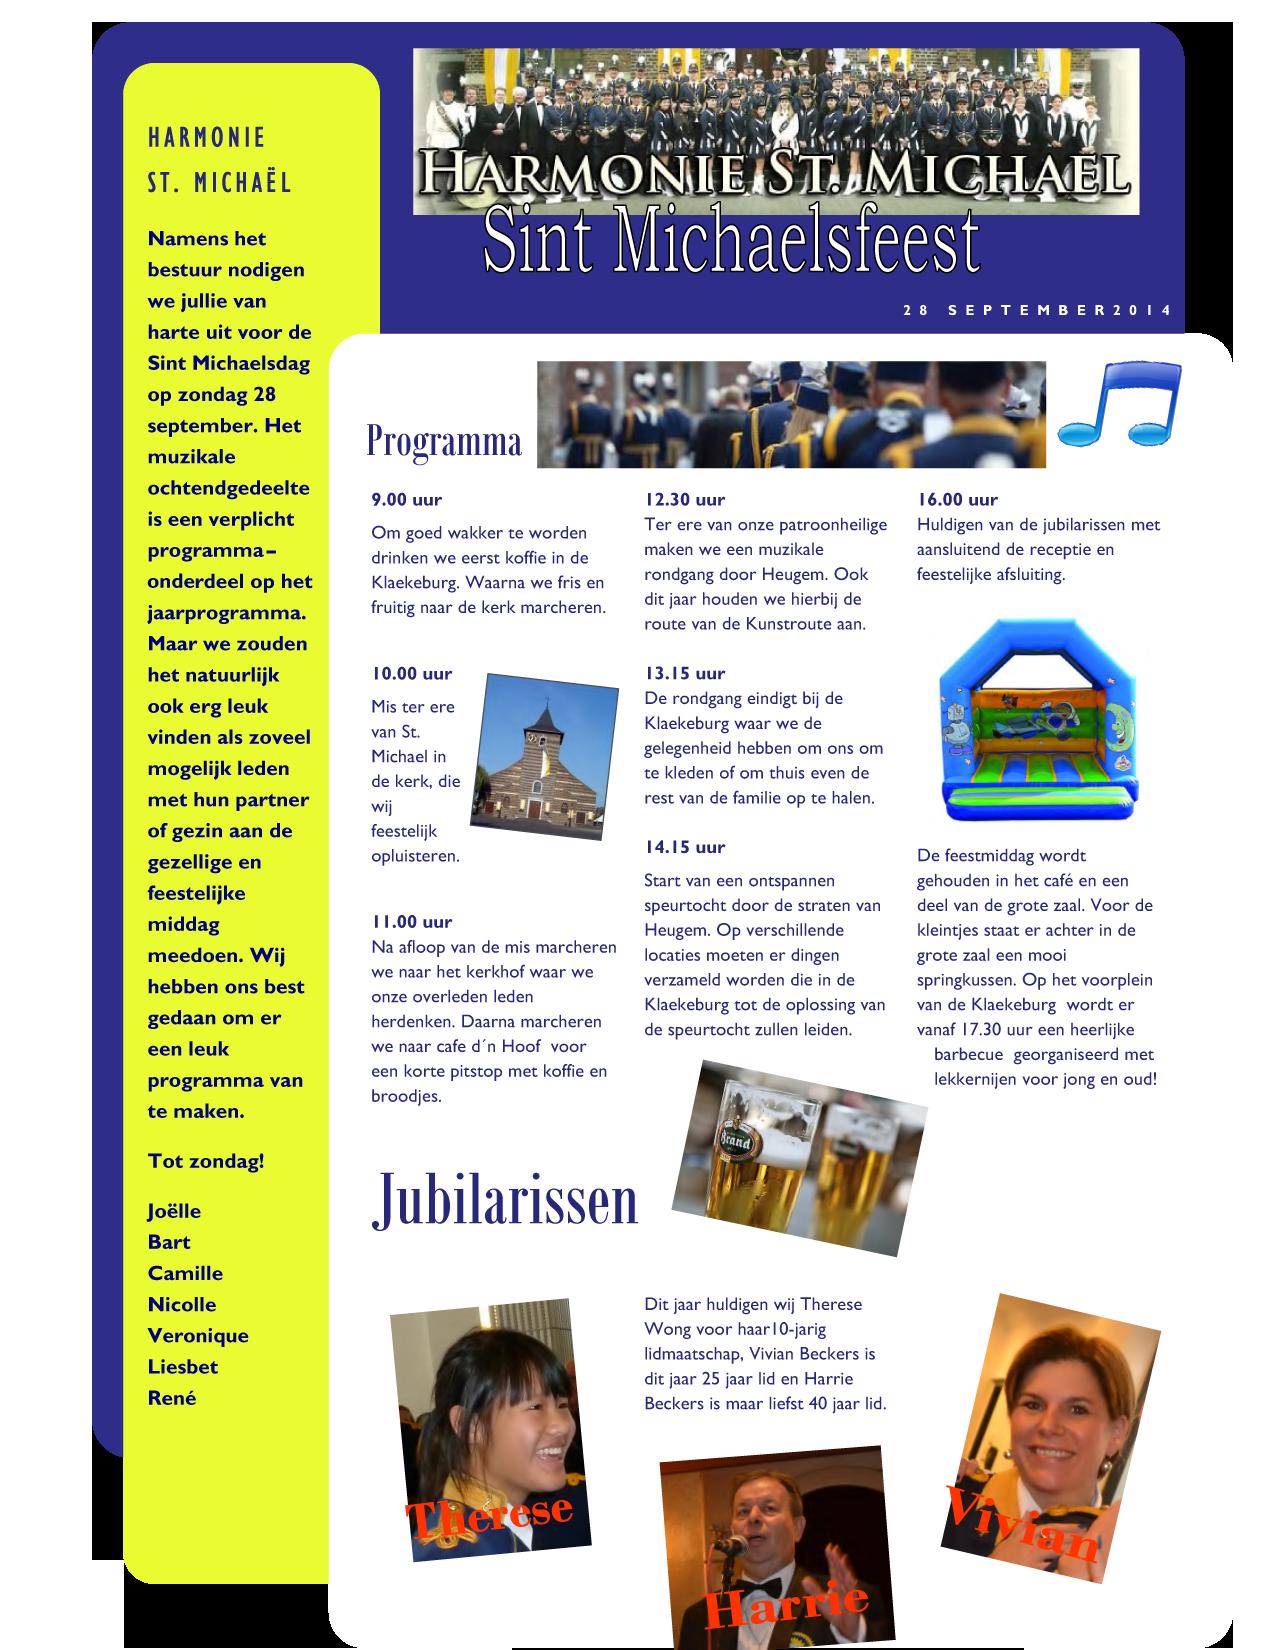 St. Michaelsfeest 2014